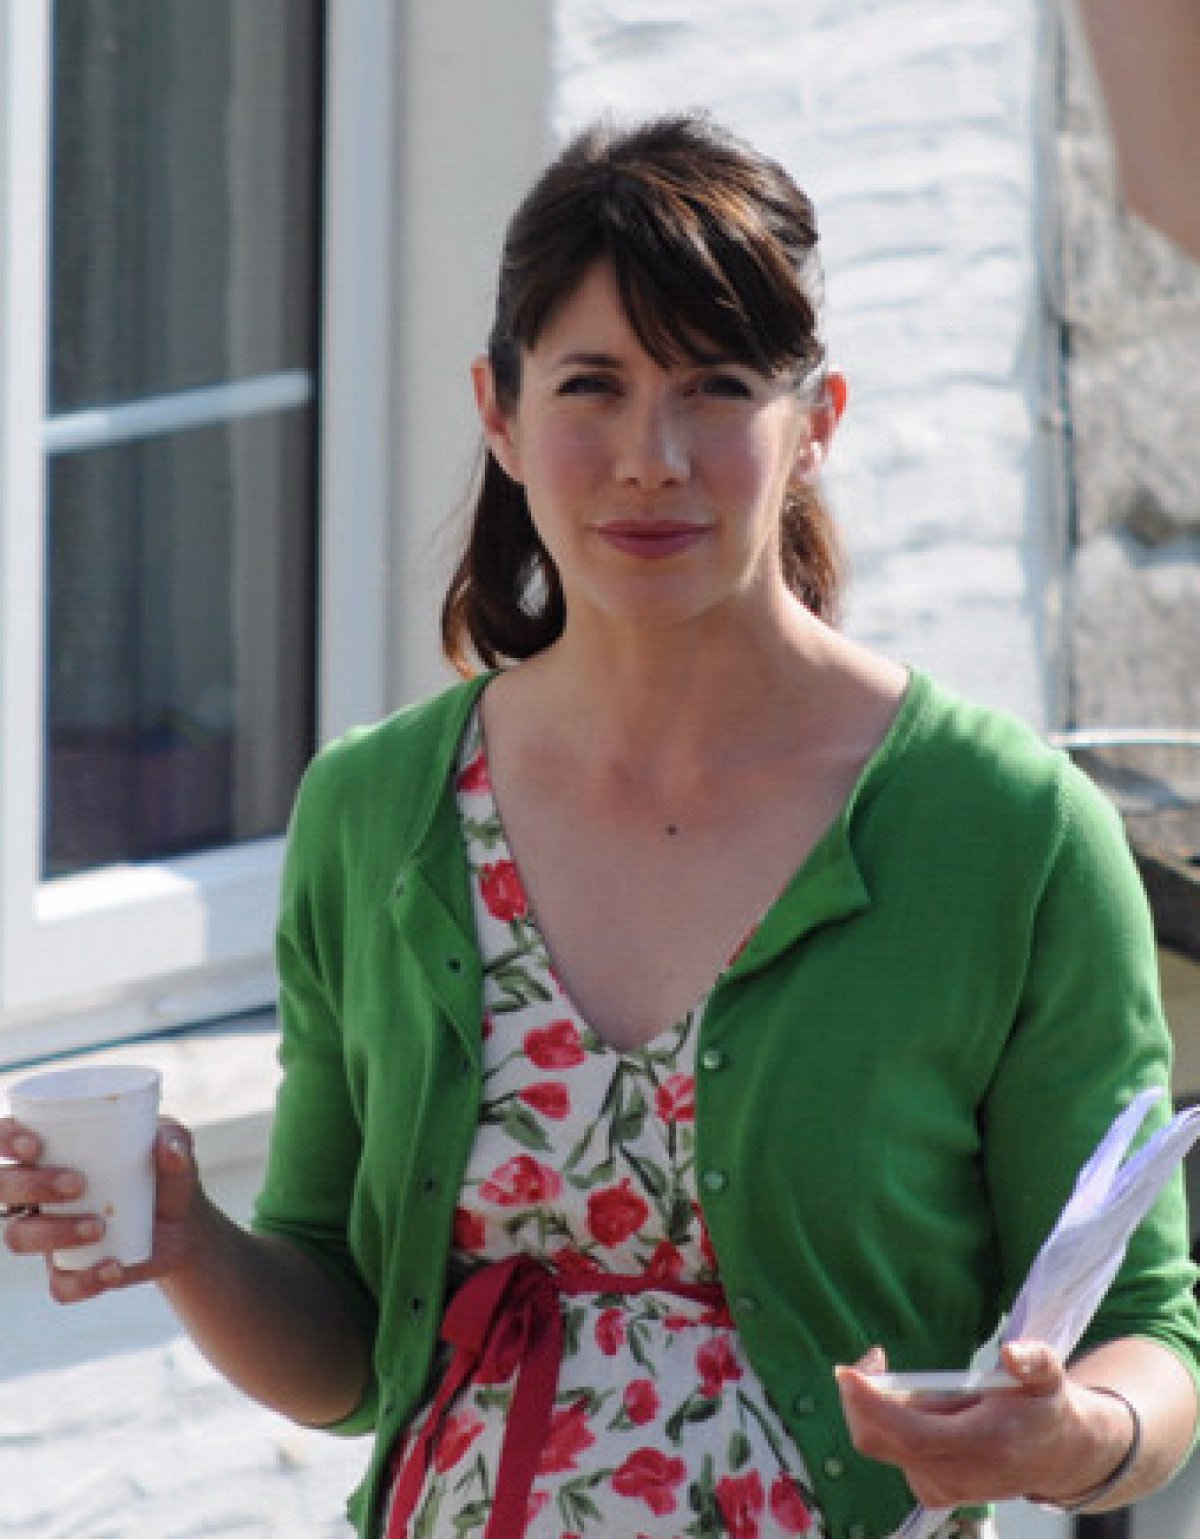 Catherine Catz doc martin' renewed for two more seasons - reality tv world